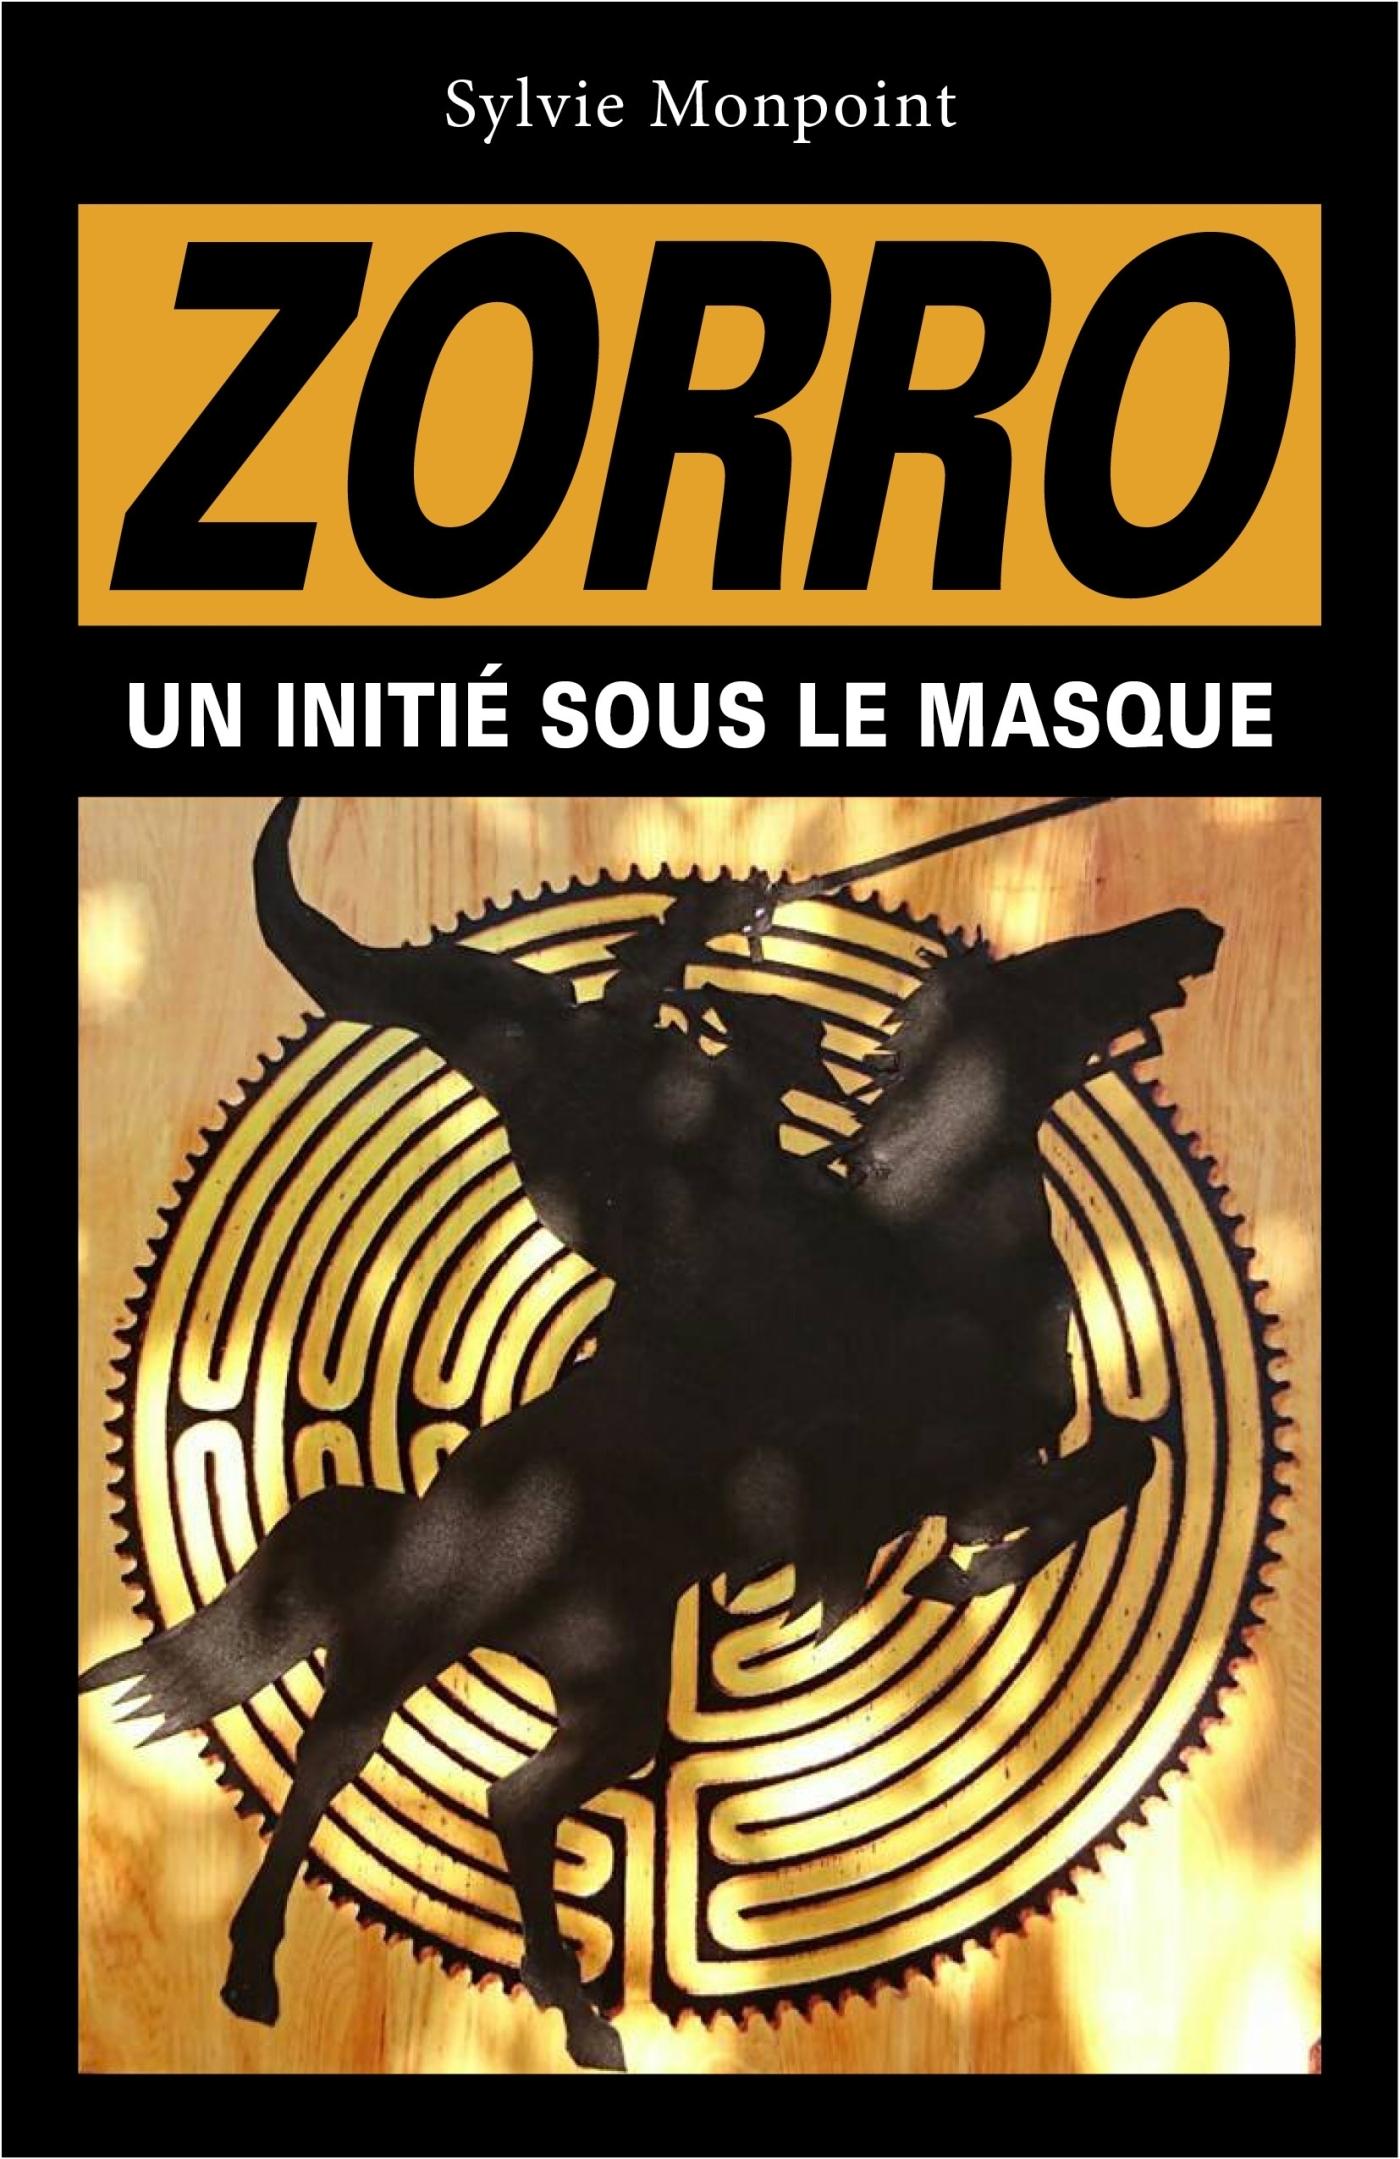 ZORRO - UN INITIE SOUS LE MASQUE